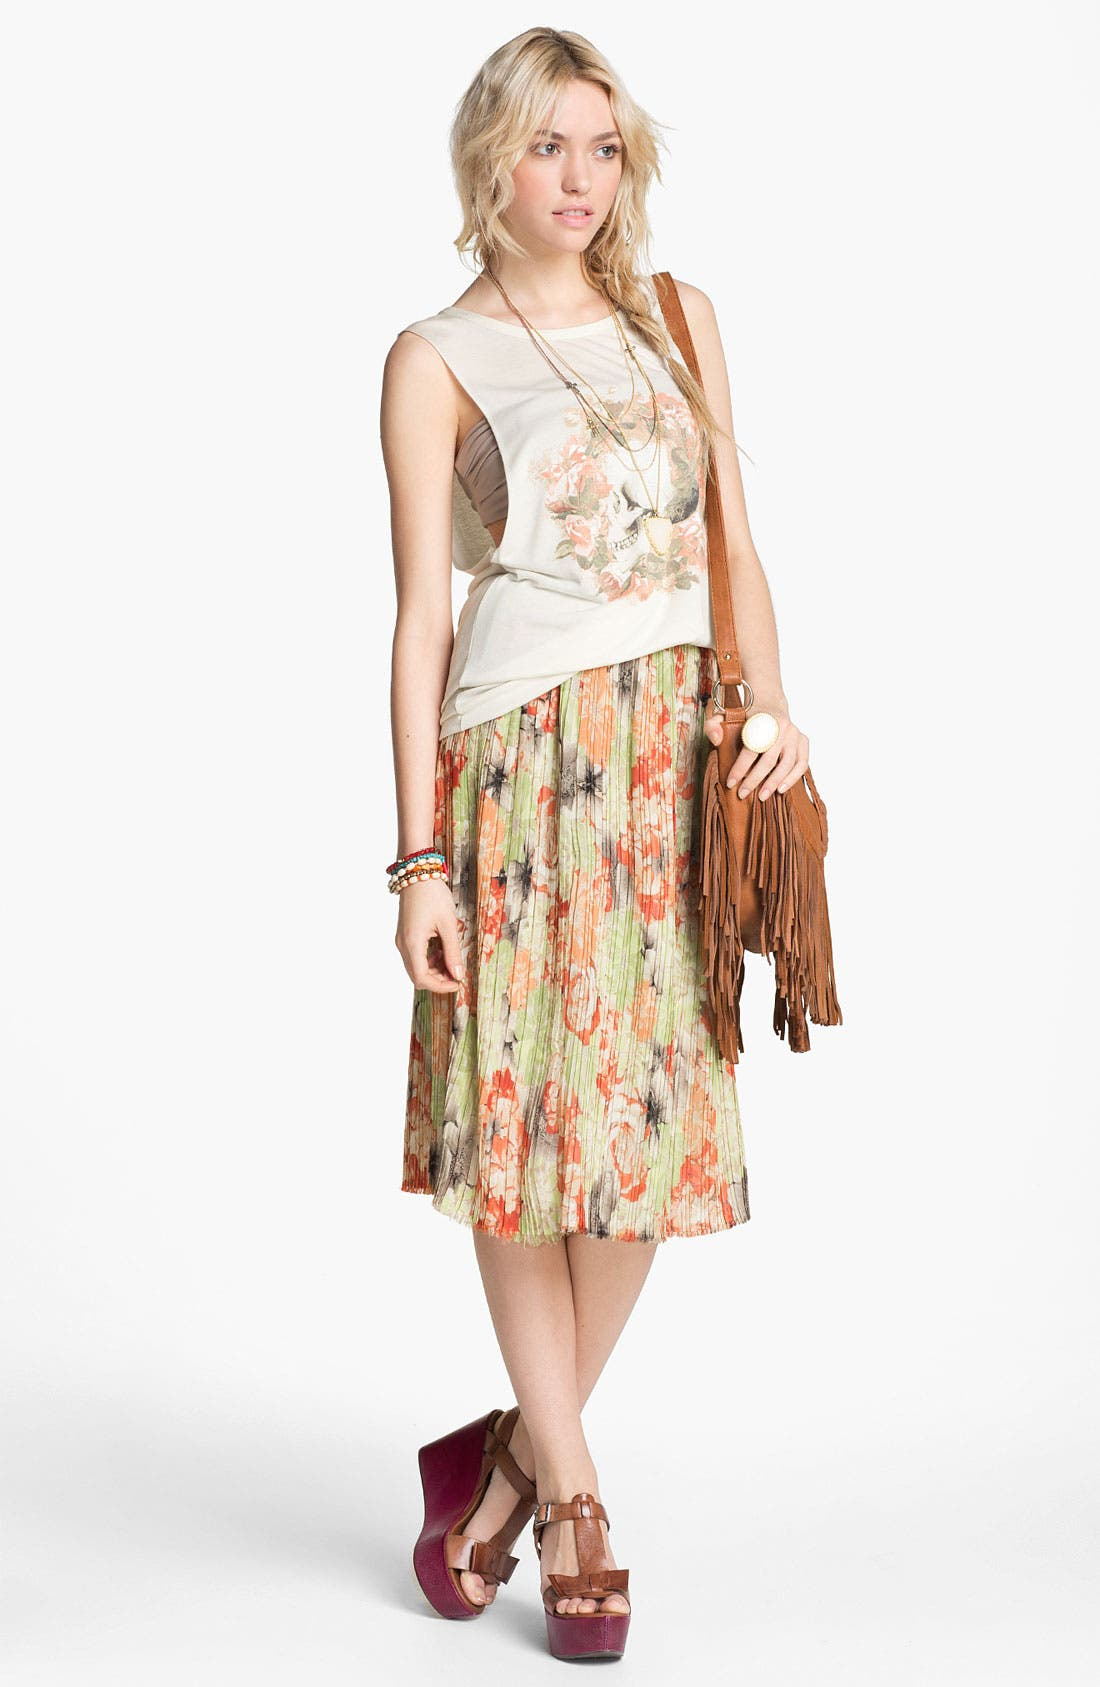 Alternate Image 1 Selected - TWP Muscle Tee & Like Mynded Skirt